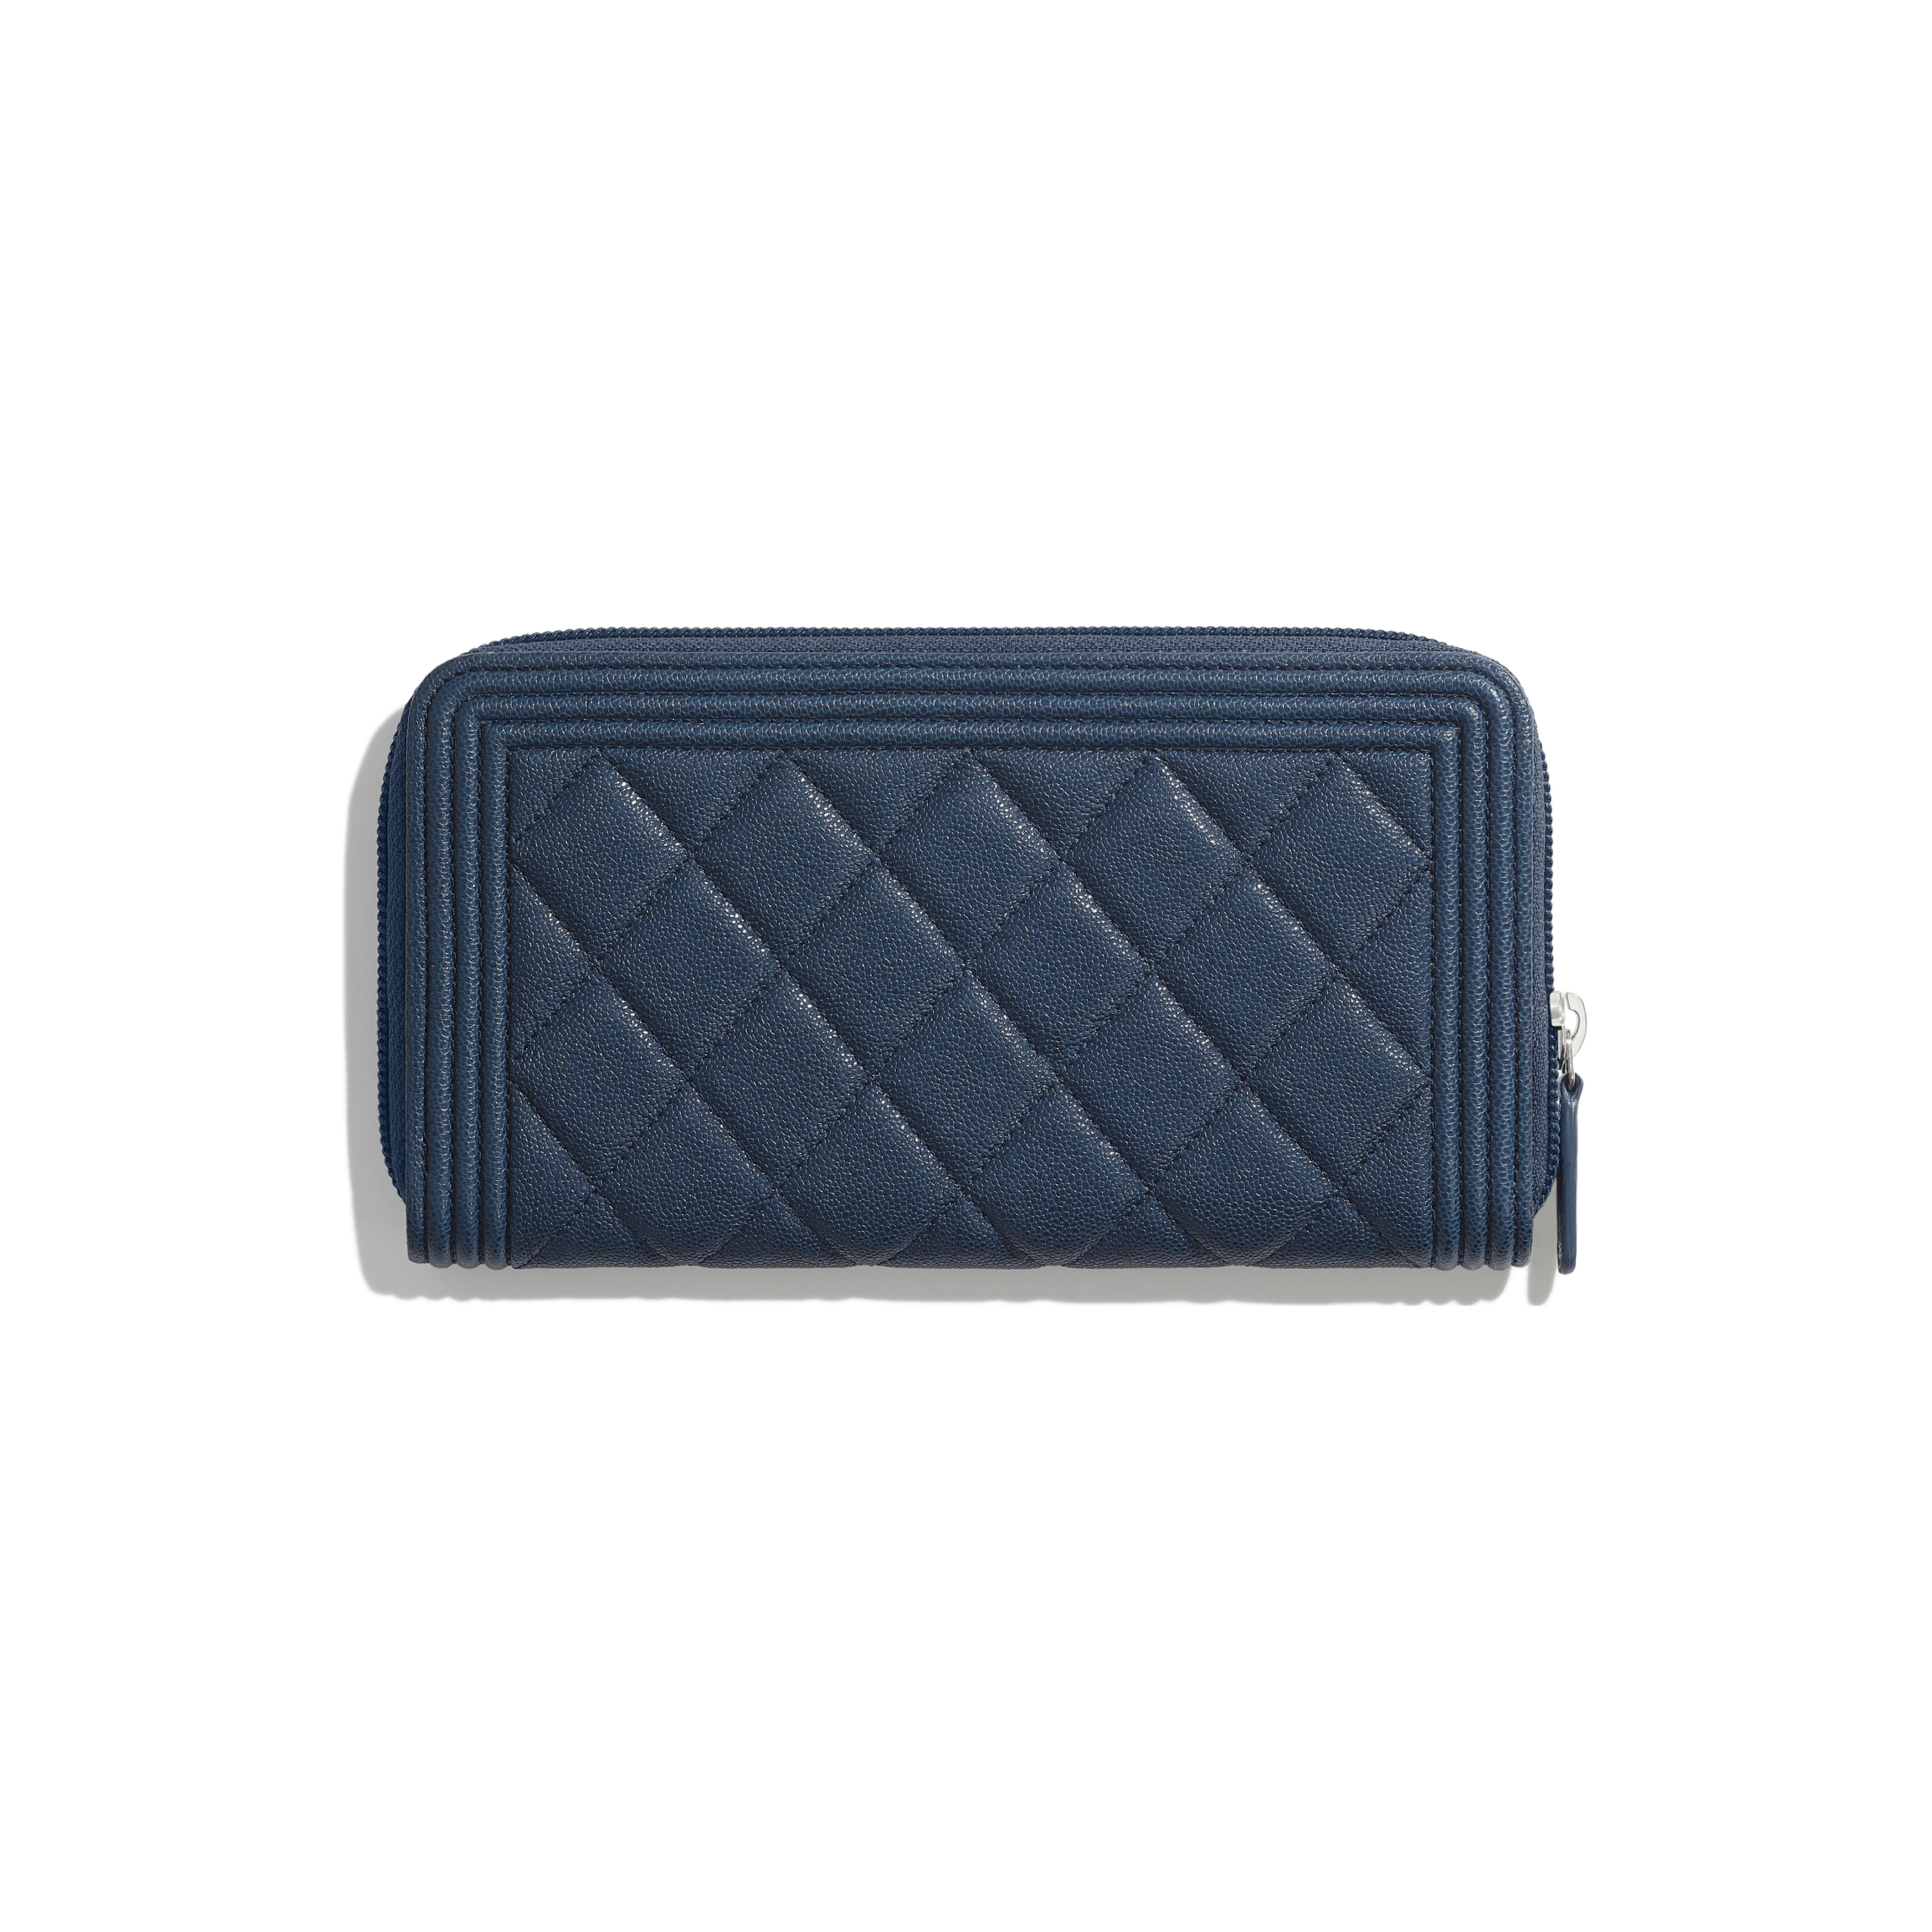 BOY CHANEL Long Zipped Wallet - Blue - Grained Calfskin & Silver Metal - Alternative view - see full sized version